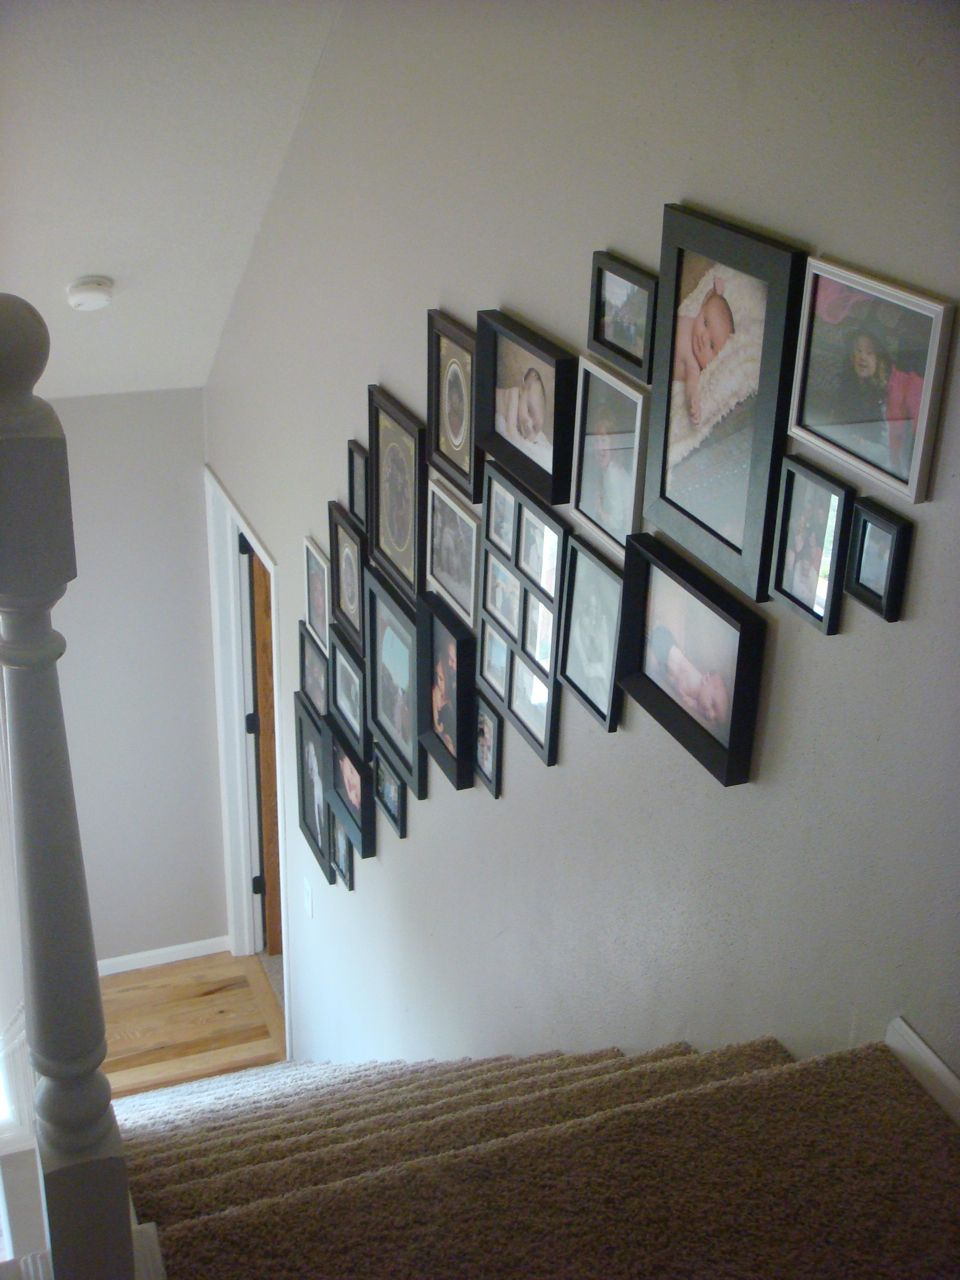 fotowand im treppenhaus einrichtung pinterest treppe treppenhaus und fotowand. Black Bedroom Furniture Sets. Home Design Ideas